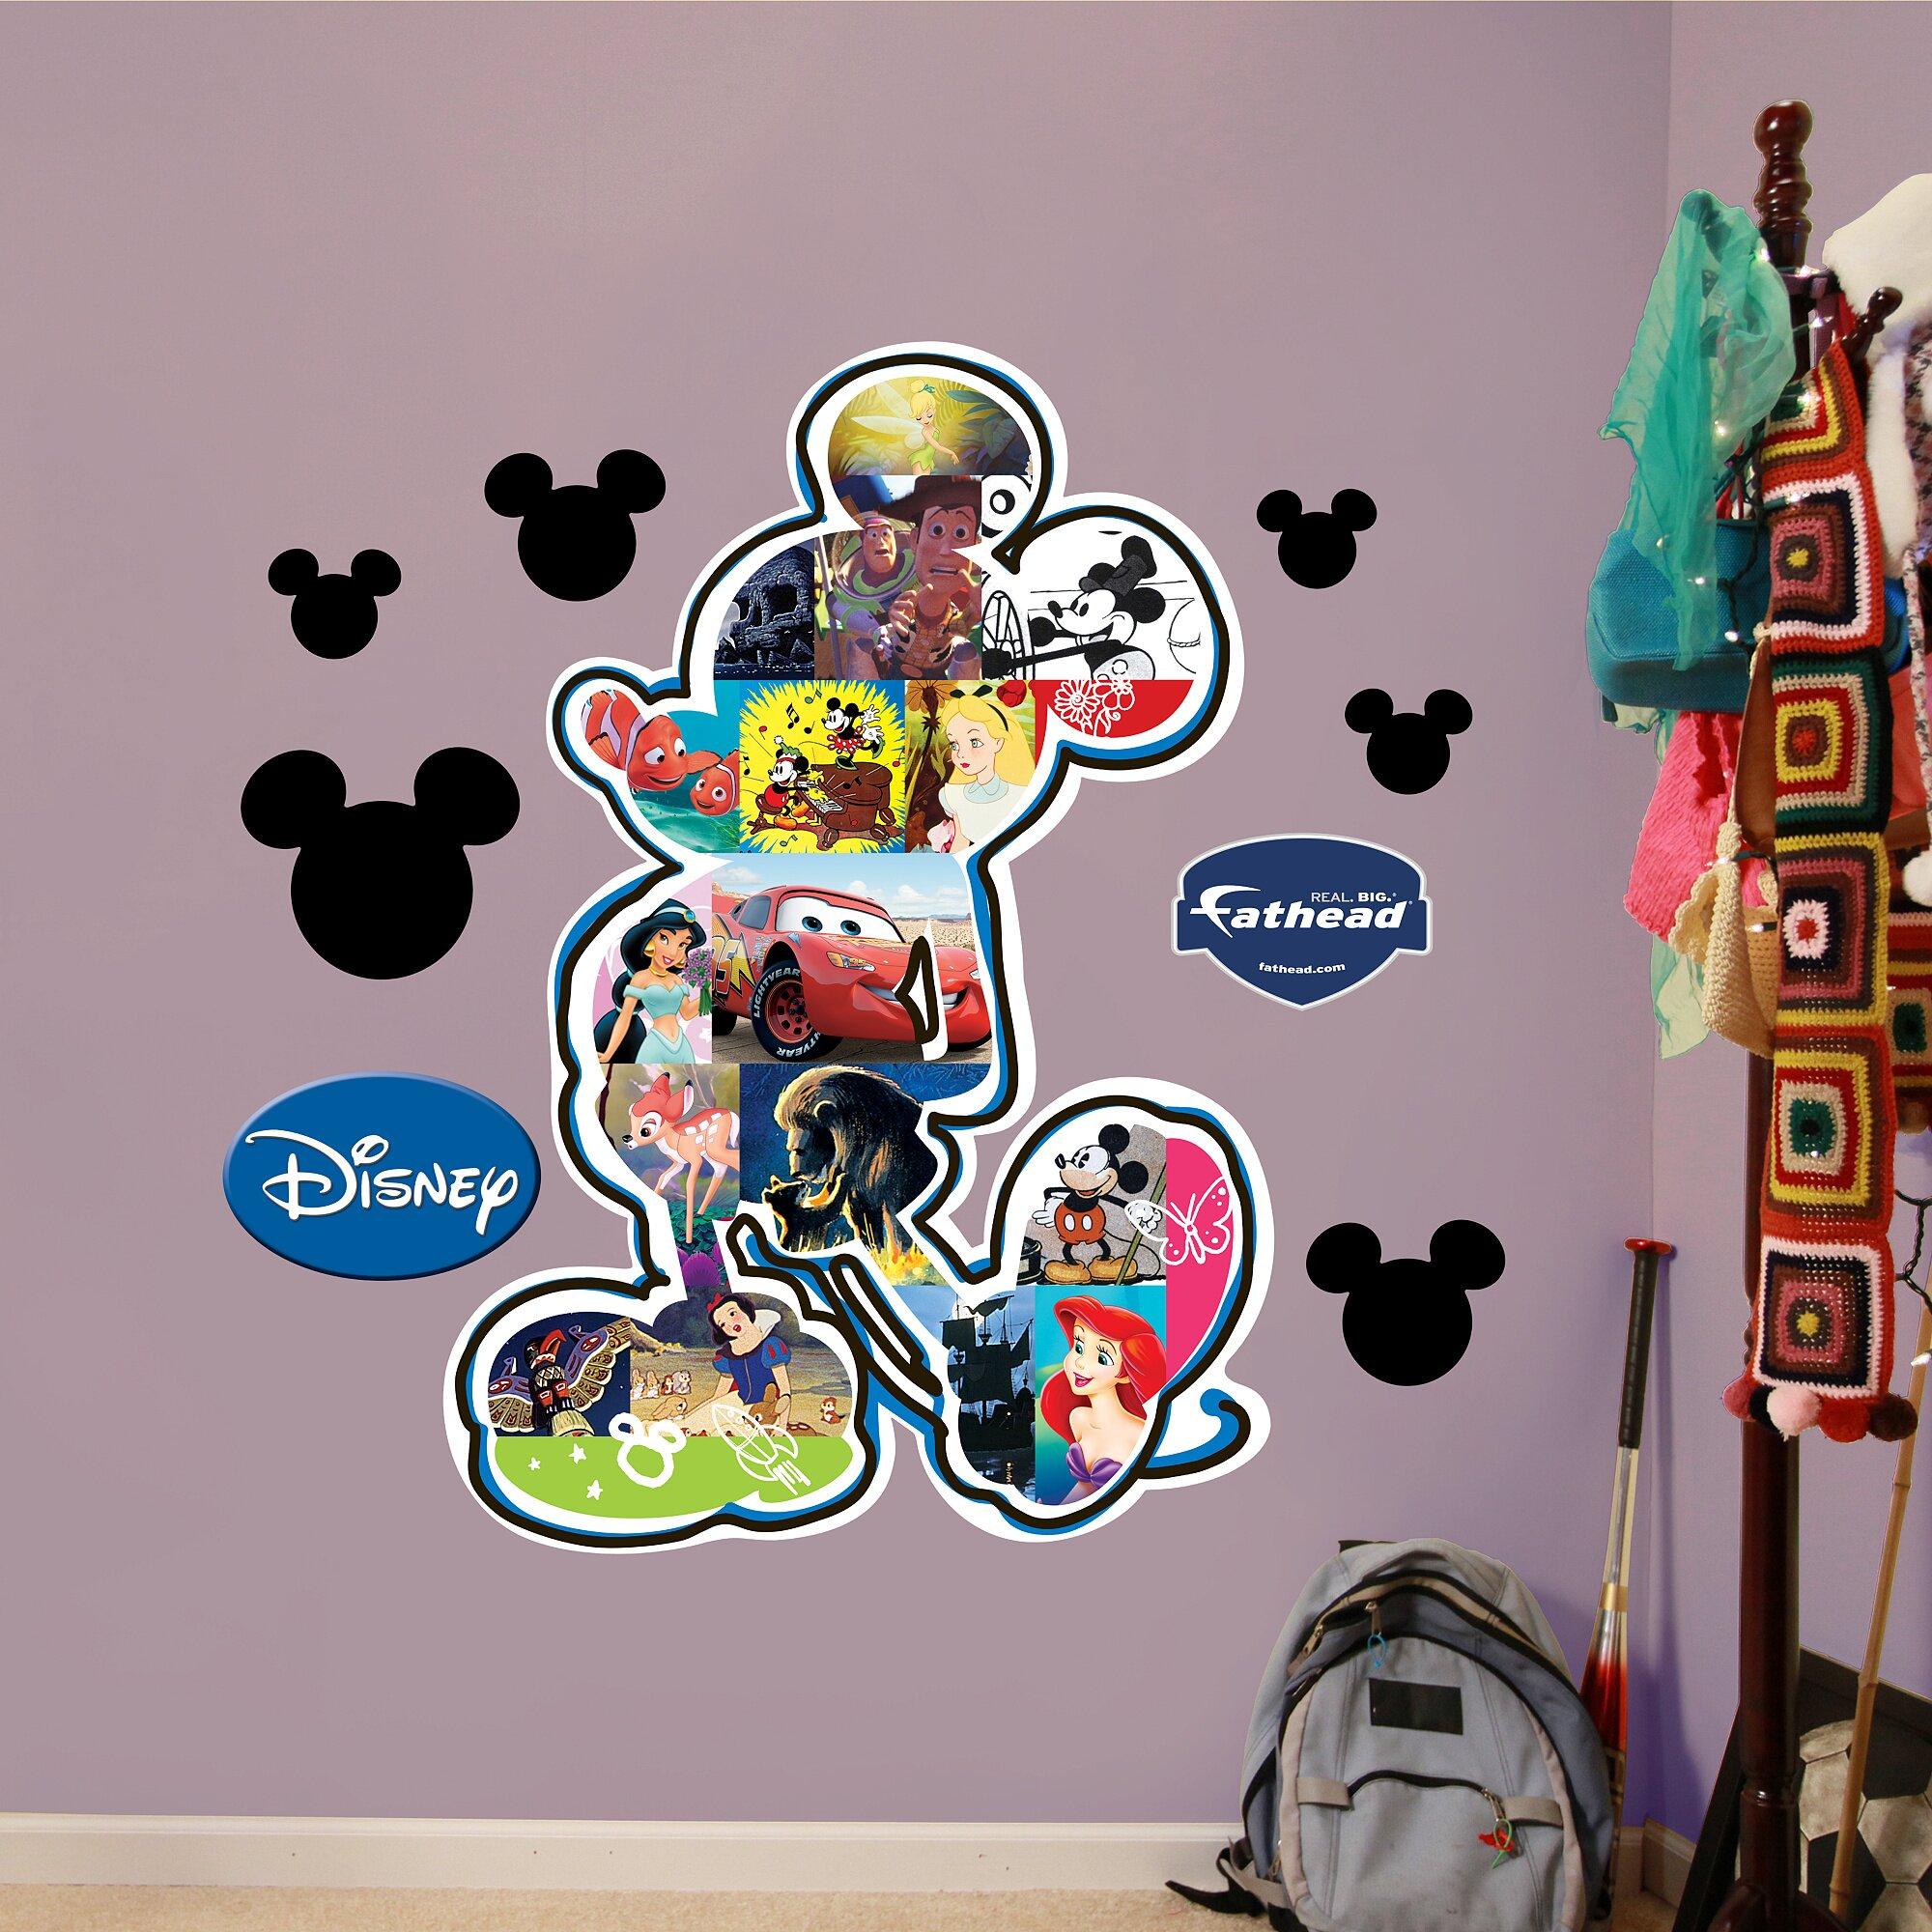 Fathead Disney Mickey Mouse Movie Montage Wall Decal. Fathead Disney Mickey Mouse Movie Montage Wall Decal   Wayfair